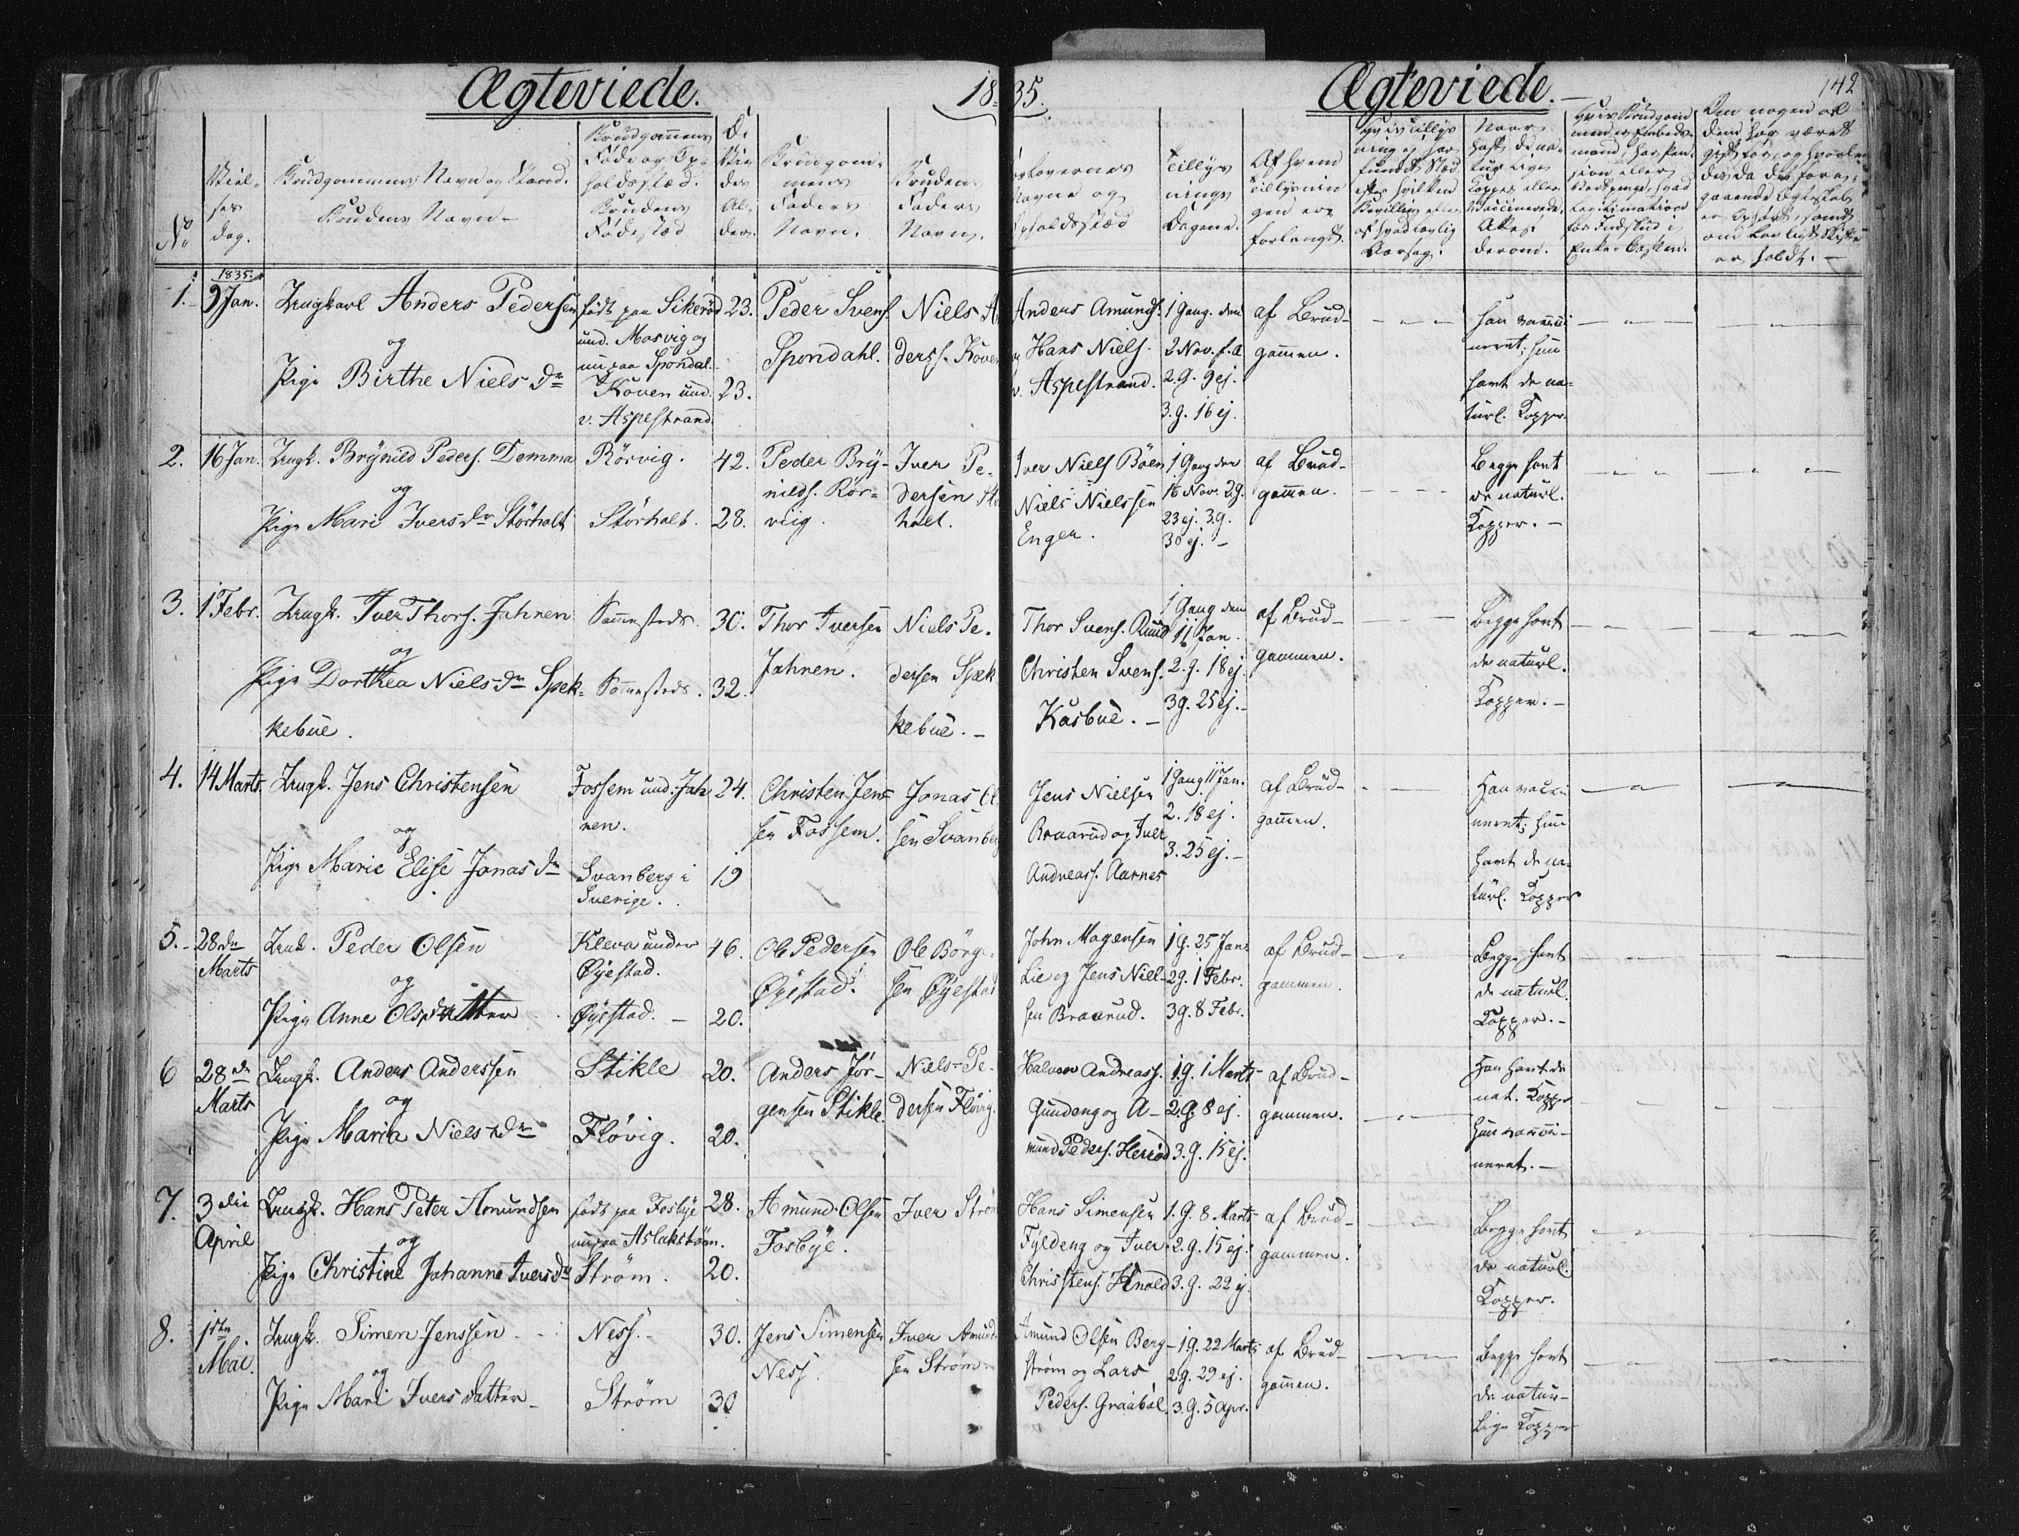 SAO, Aremark prestekontor Kirkebøker, F/Fc/L0002: Ministerialbok nr. III 2, 1834-1849, s. 142